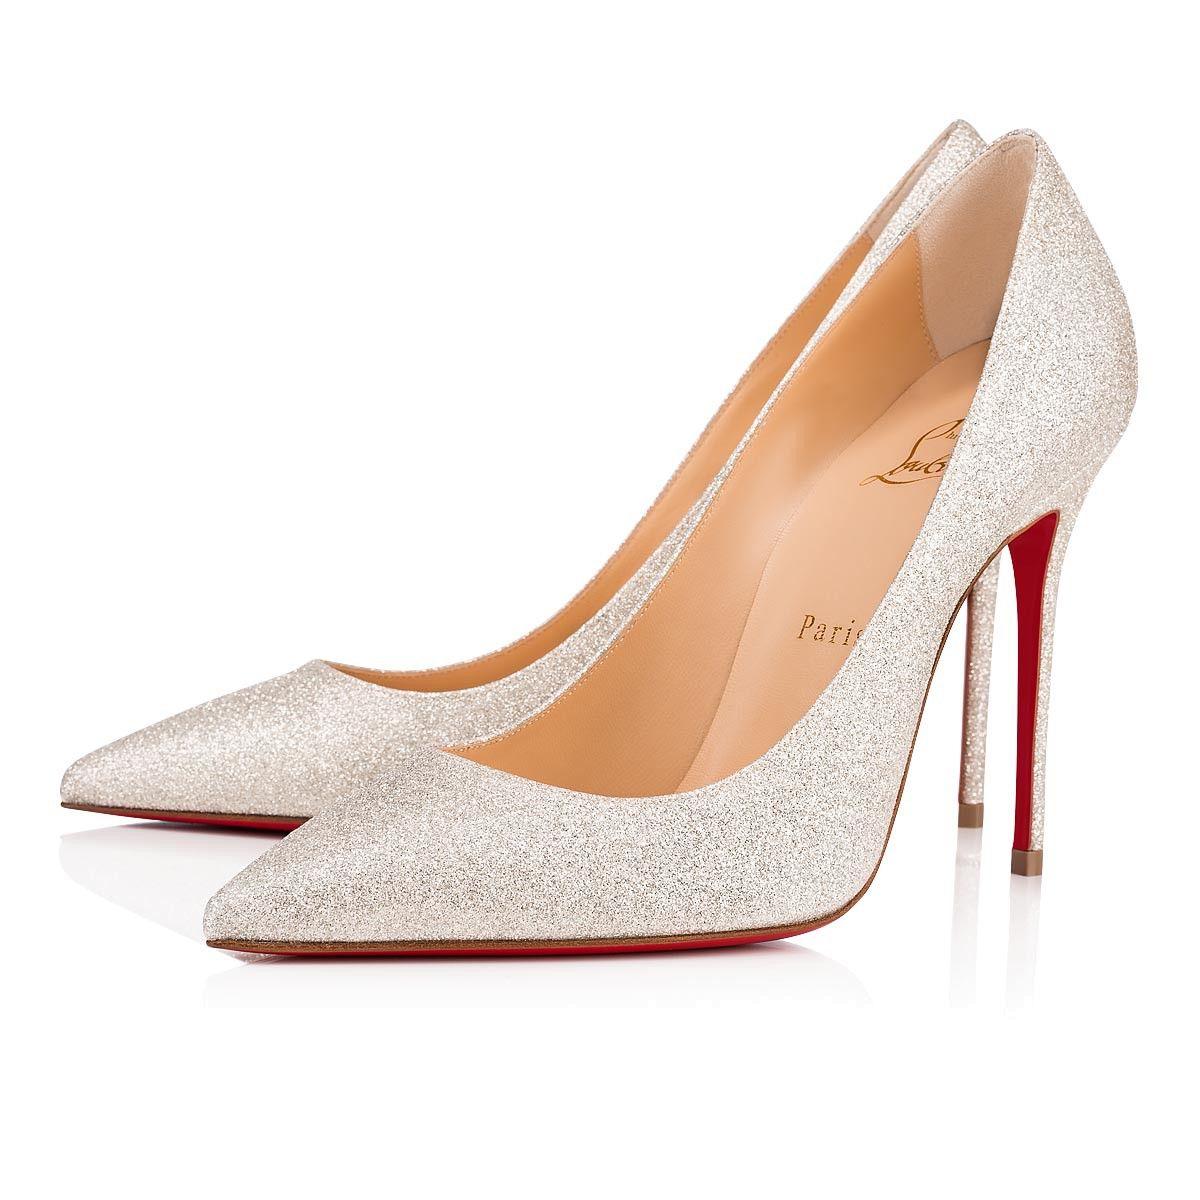 8cc343671d0 NIB Christian Louboutin Pigalle Follies 100 White Latte Wedding Heel ...